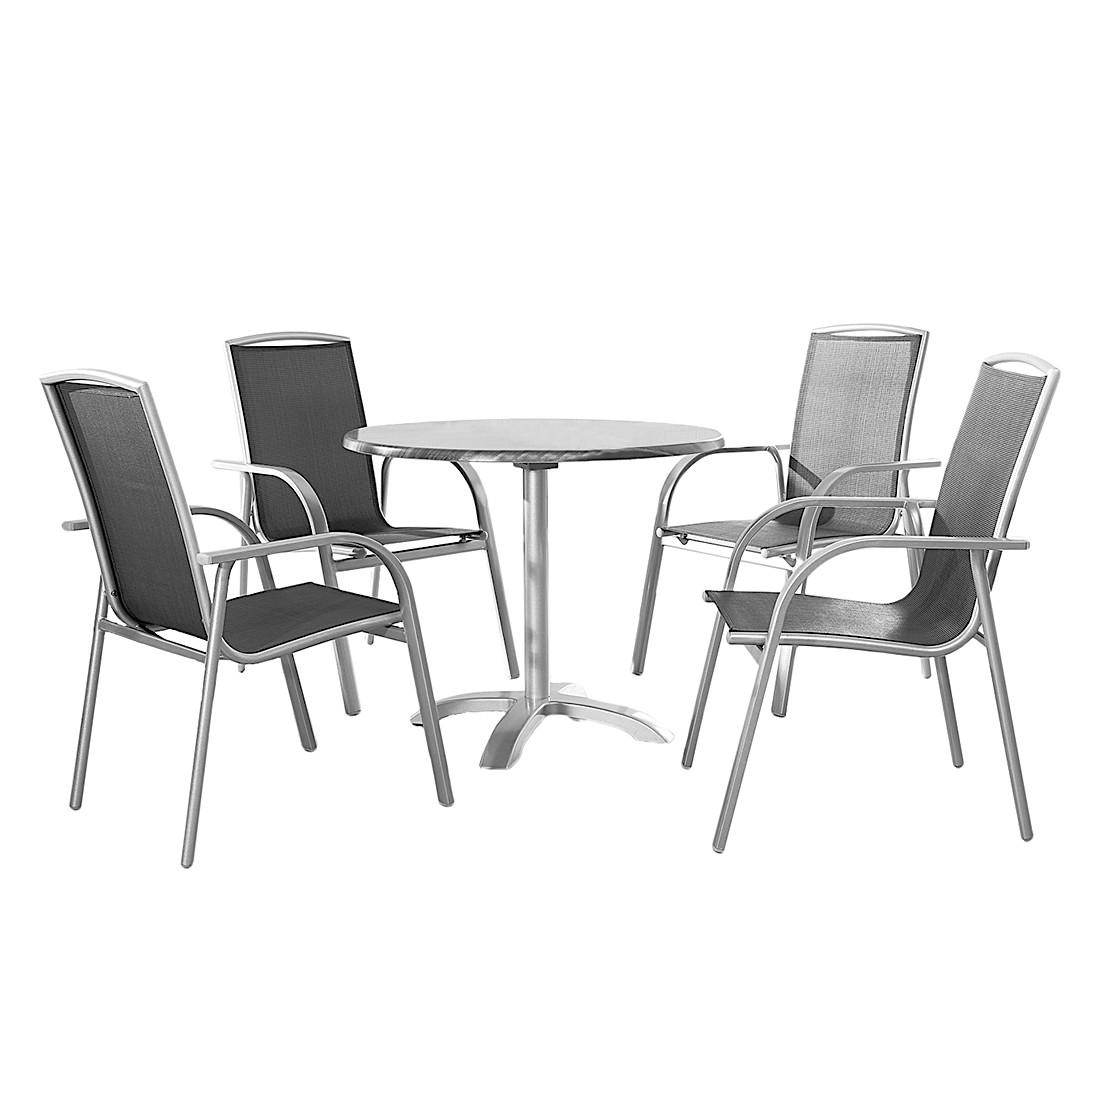 Gartensitzgruppe Milazzo (5-teilig) - Aluminium/Werzalit/Ergotex, Best Freizeitmöbel